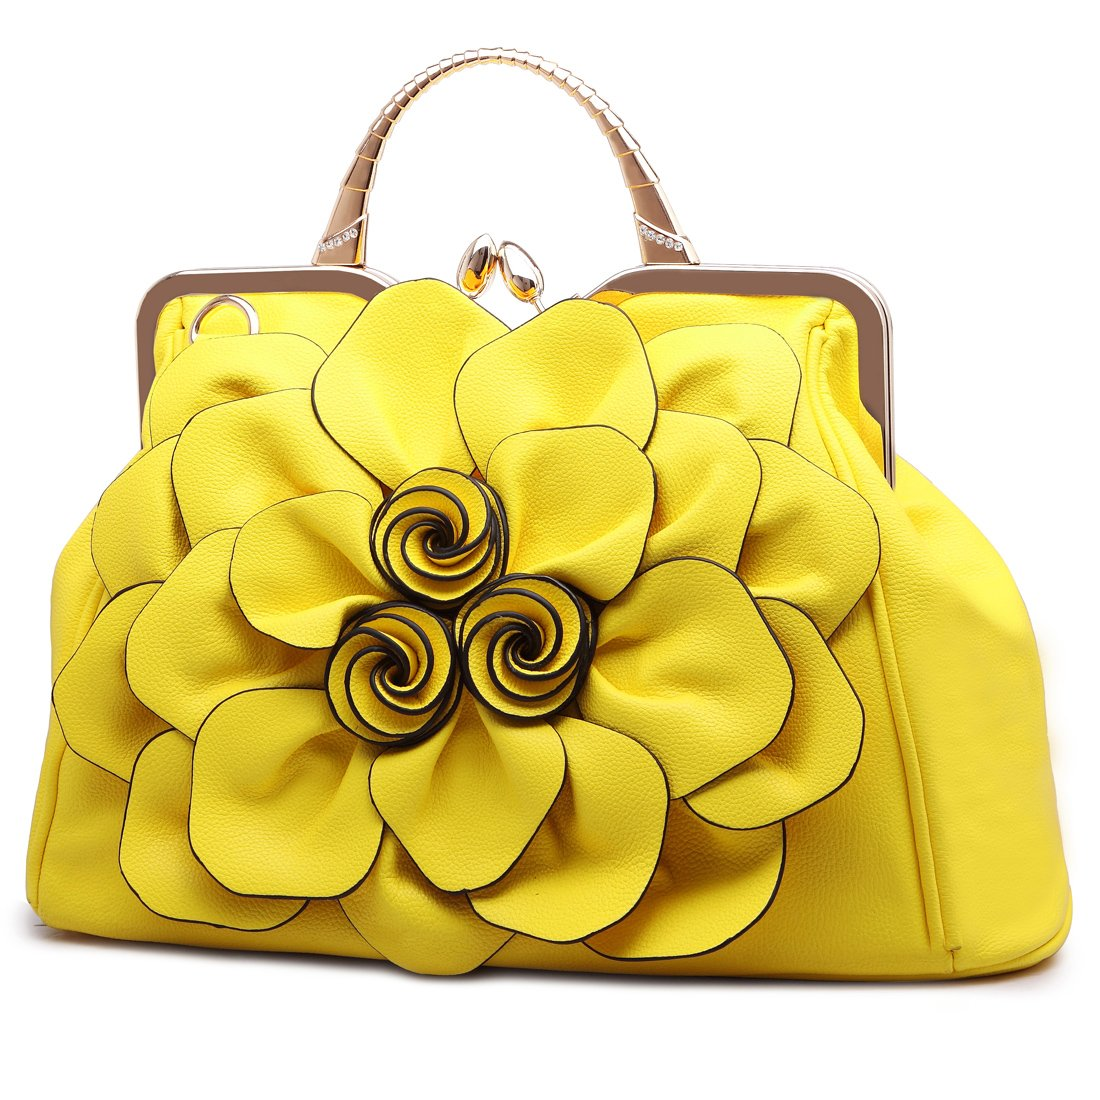 9156huang Women's Evening Clutches Handbags Wallets Wedding Totes Crossbody Bags